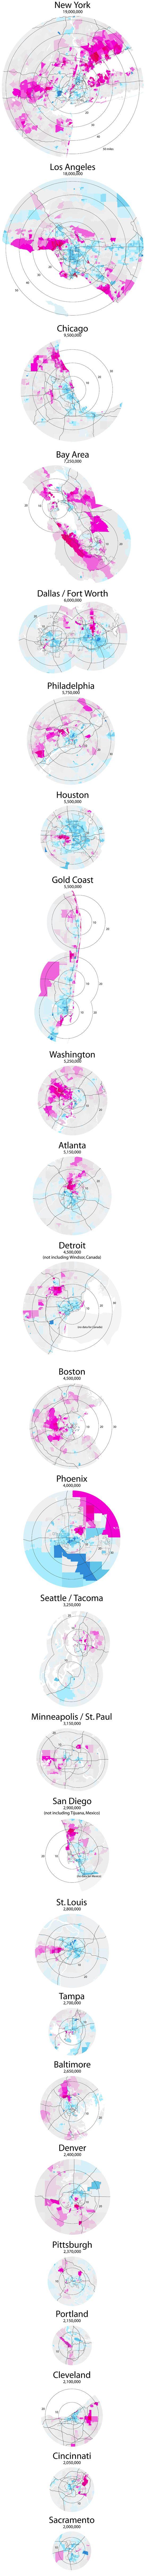 City Income Donuts Bill Rankin, 2006 This Shows The Distribution Of Income  Per Capita Around